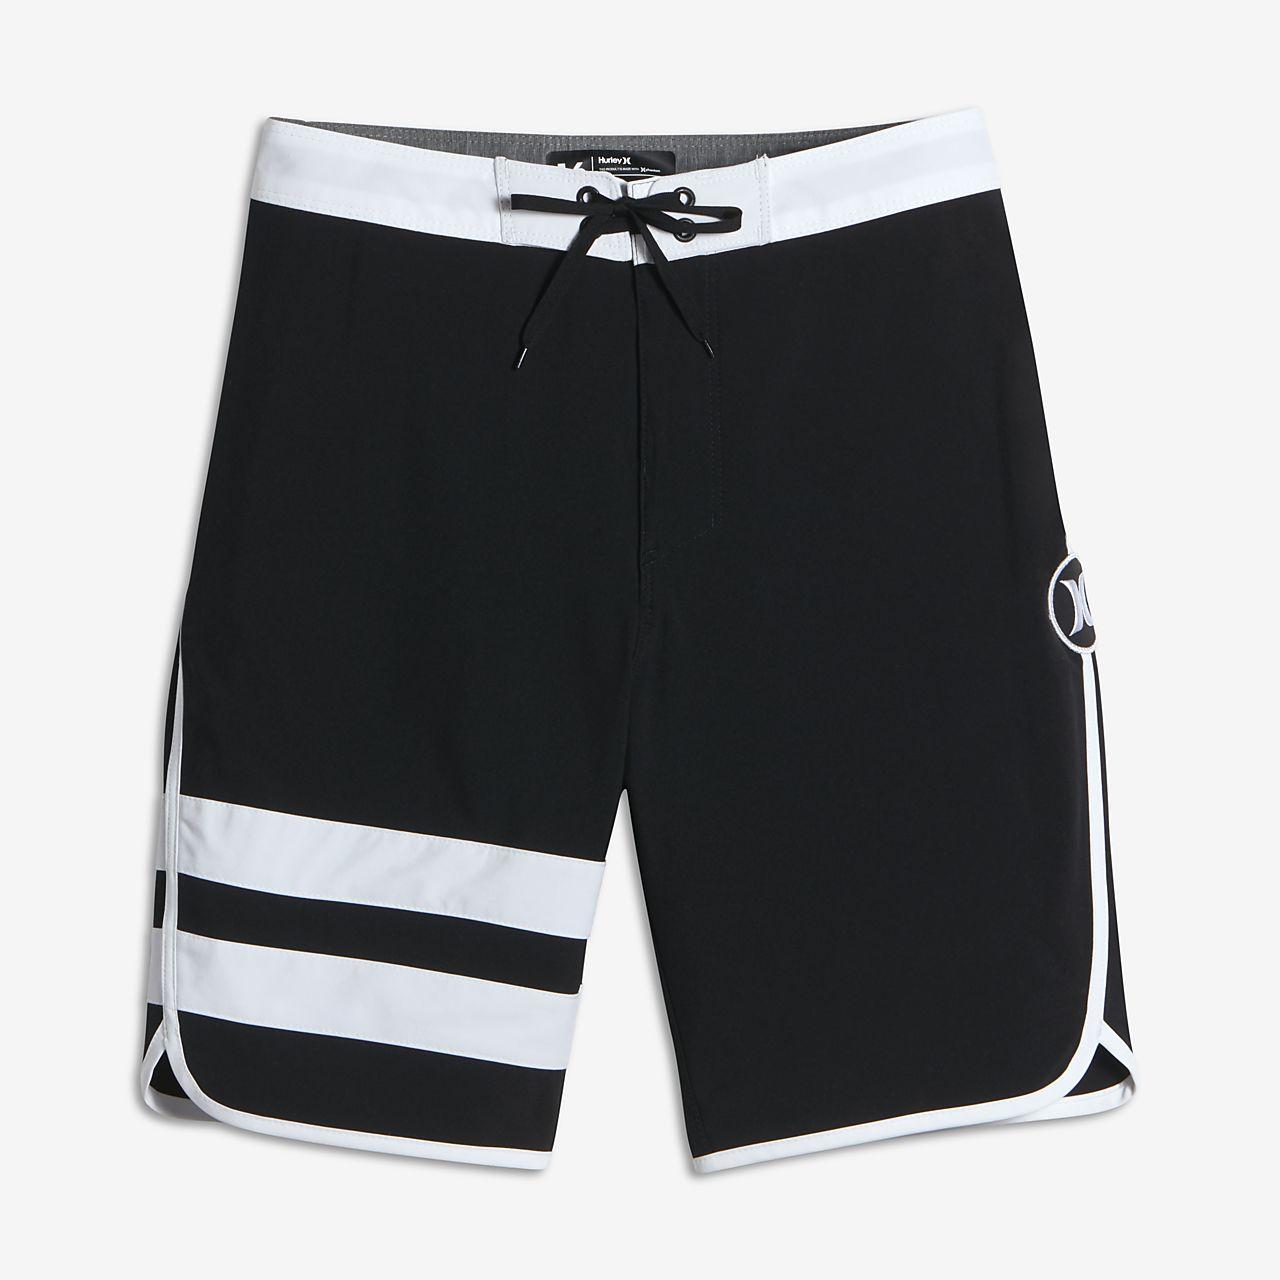 Nike Hurley Block Party Boardshorts Boys Black/White